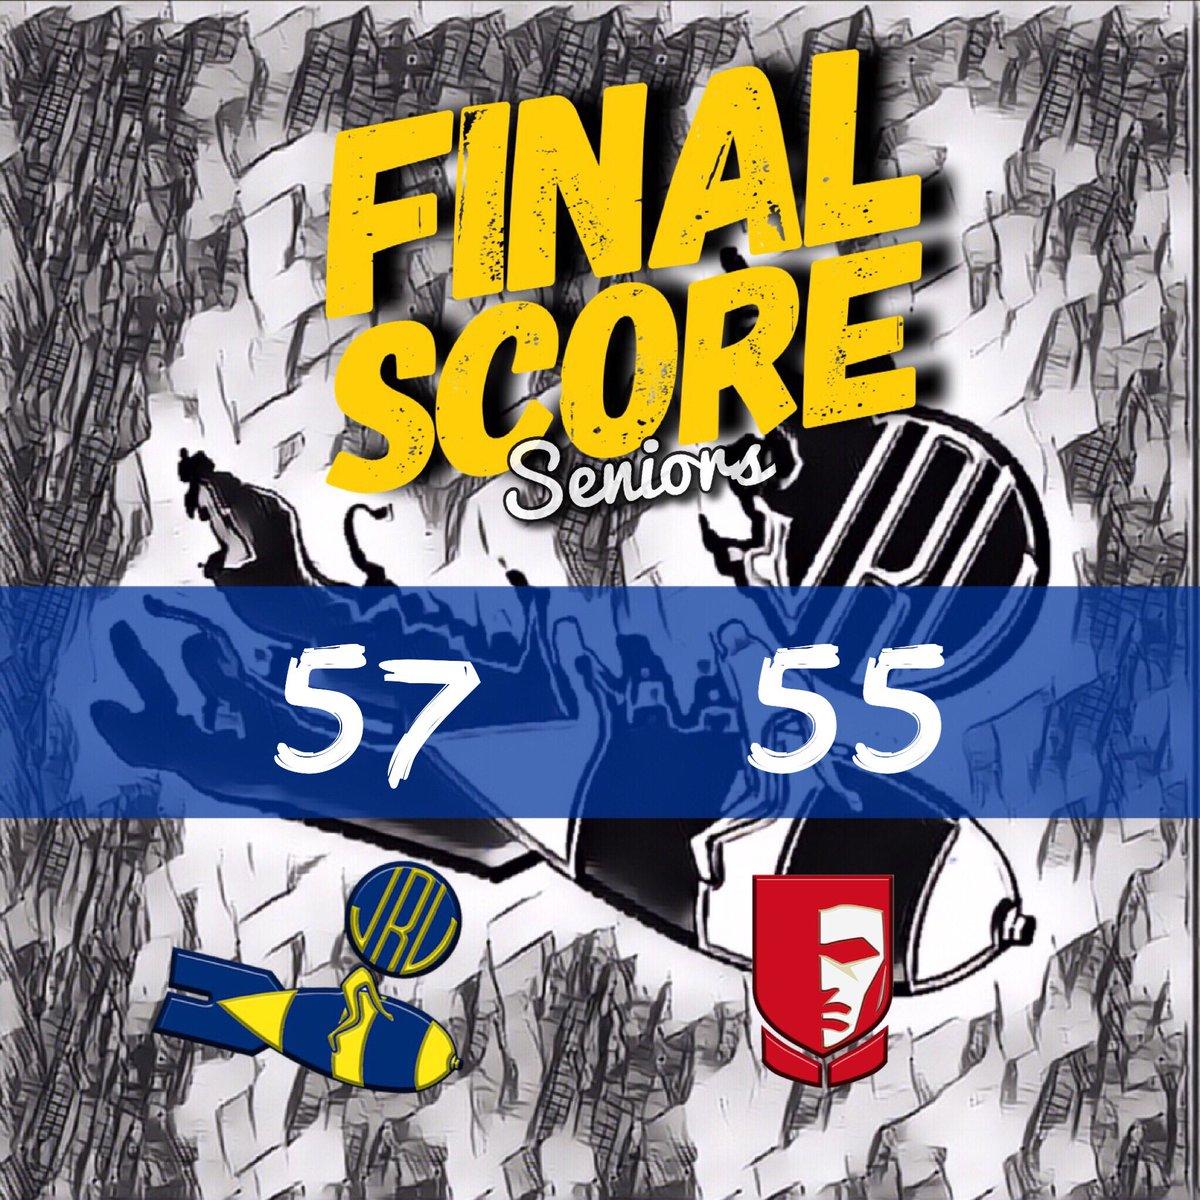 JRU Heavy Bombers defeated EAC Generals, 57-55.  Best Player: Mark Mallari  12pts 3rebs 4ast 1stl  #NCAASeason94 #MabuhayRizal #GalingJRU<br>http://pic.twitter.com/5cAgVuKwpI